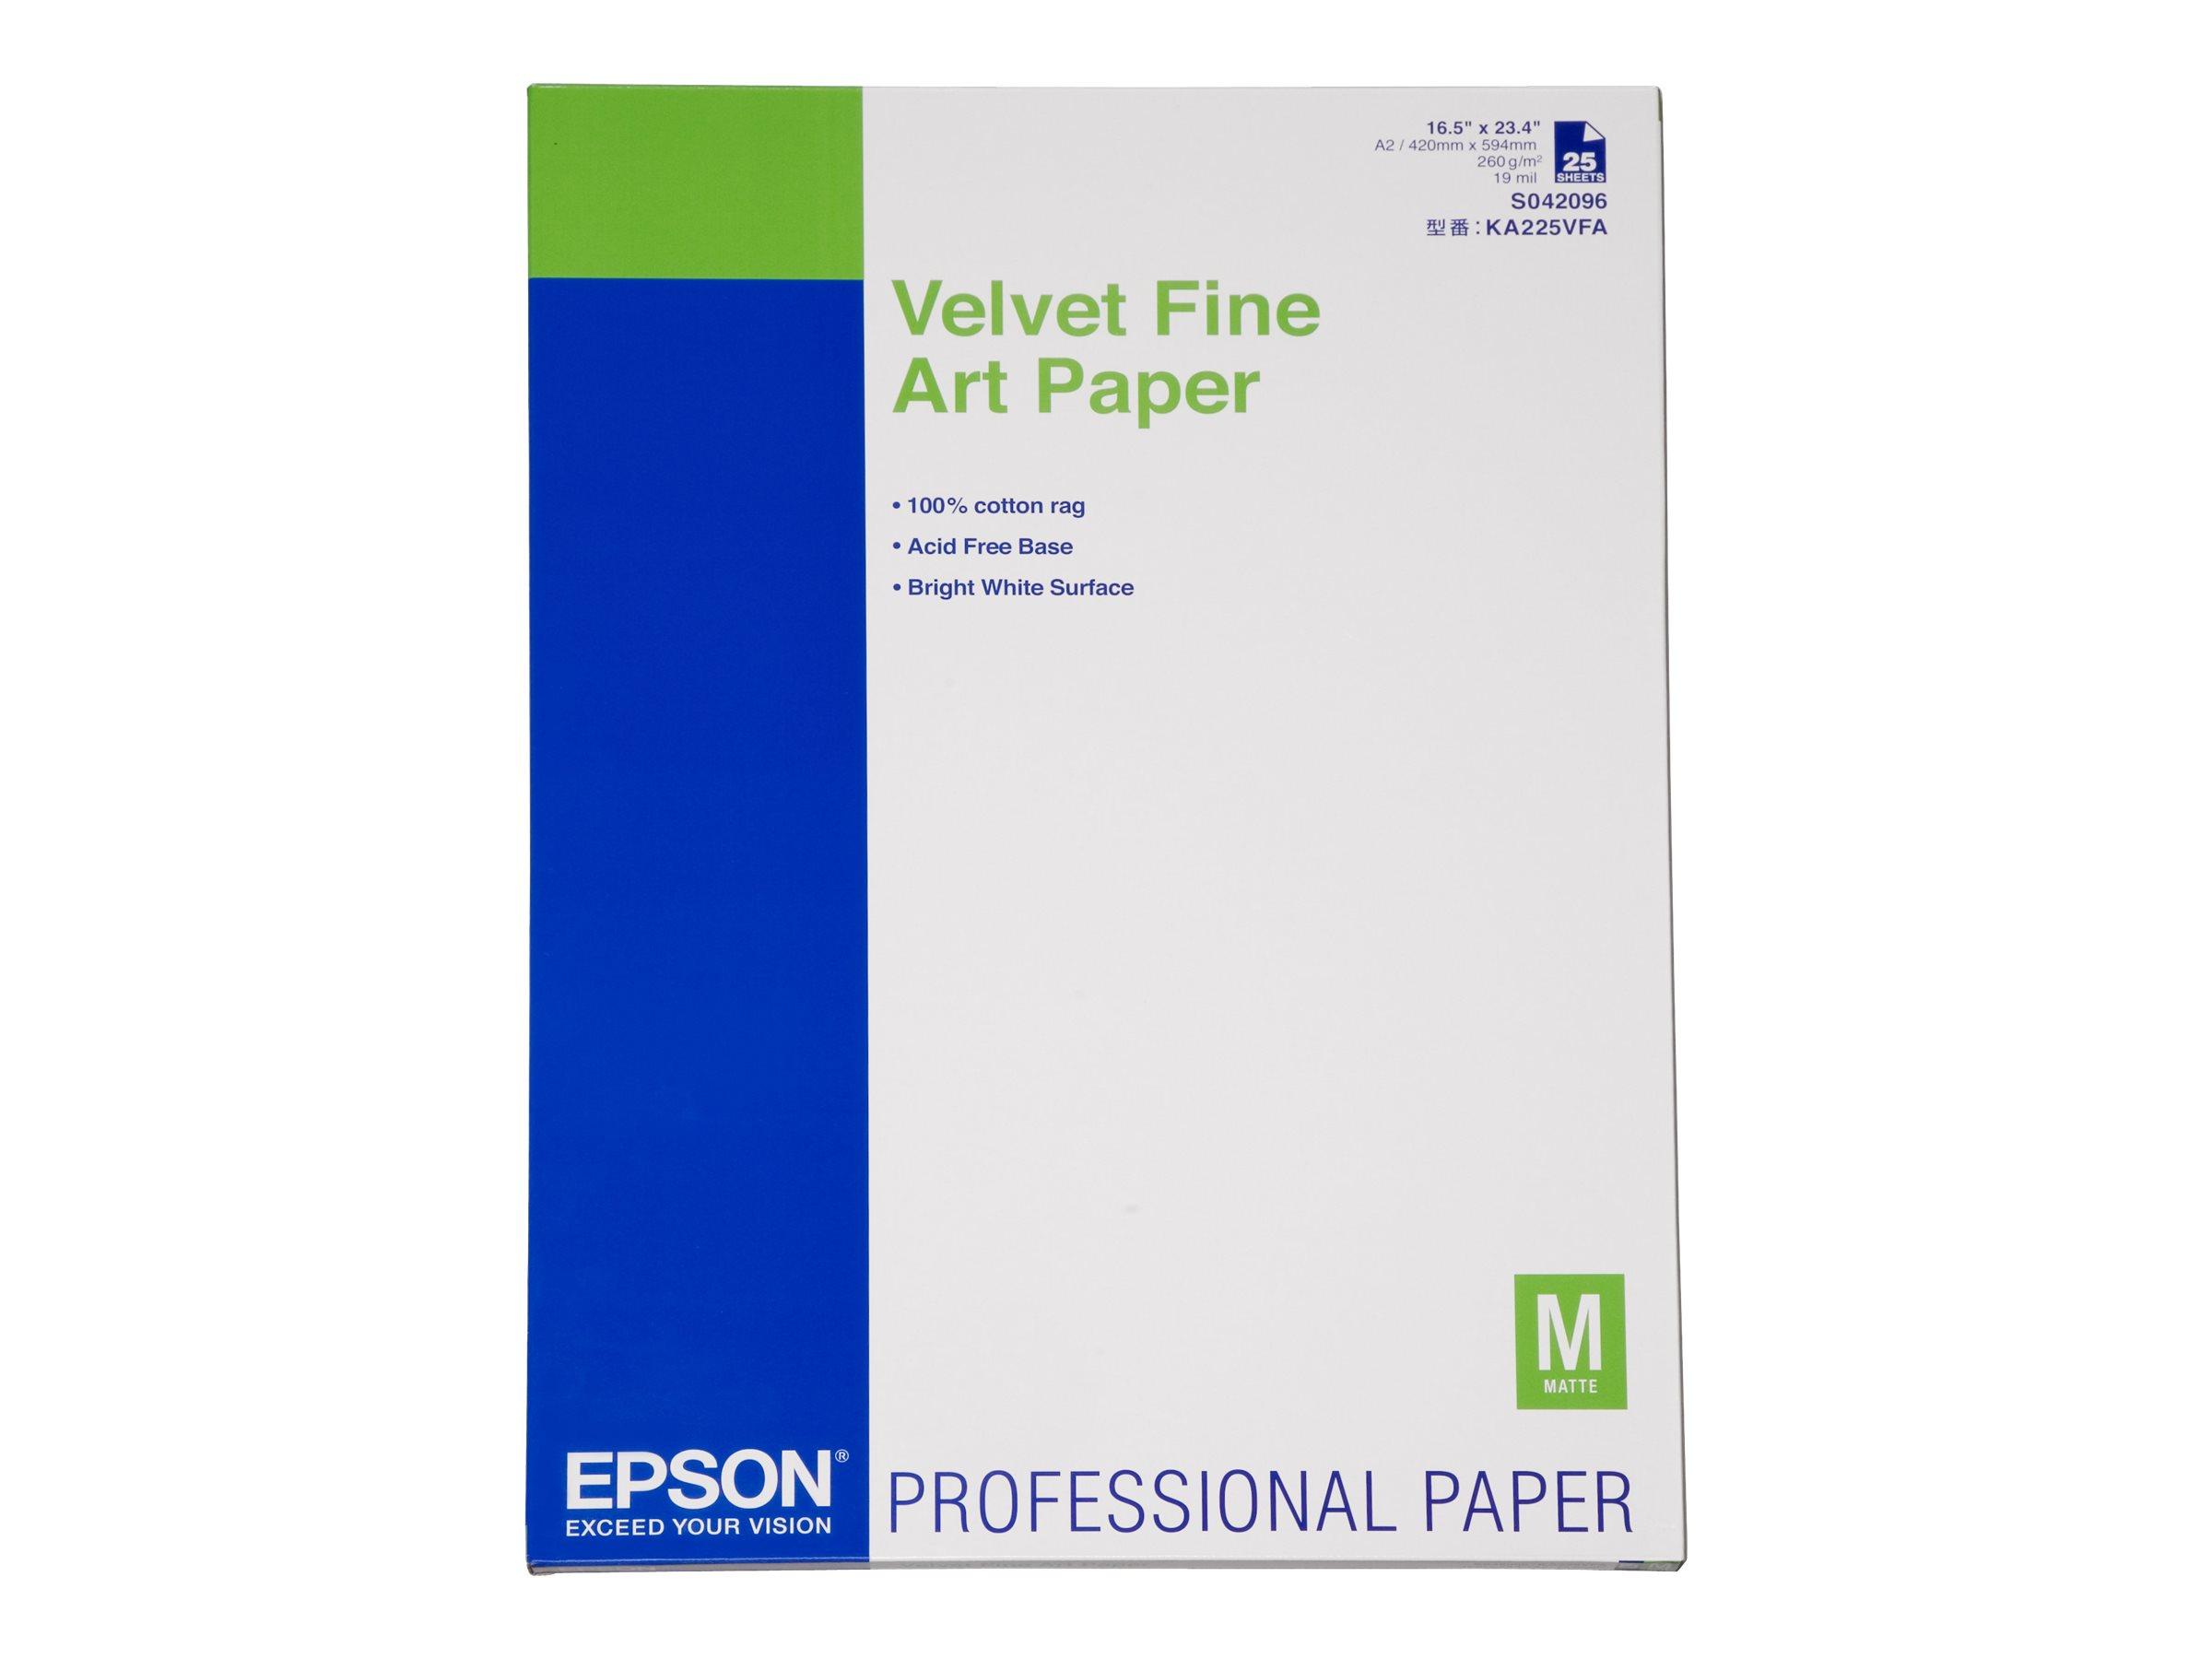 Epson Fine Art Velvet - Velvet - A2 (420 x 594 mm) 25 Blatt Kunstpapier - für SureColor P5000, P800, SC-P10000, P20000, P5000, P